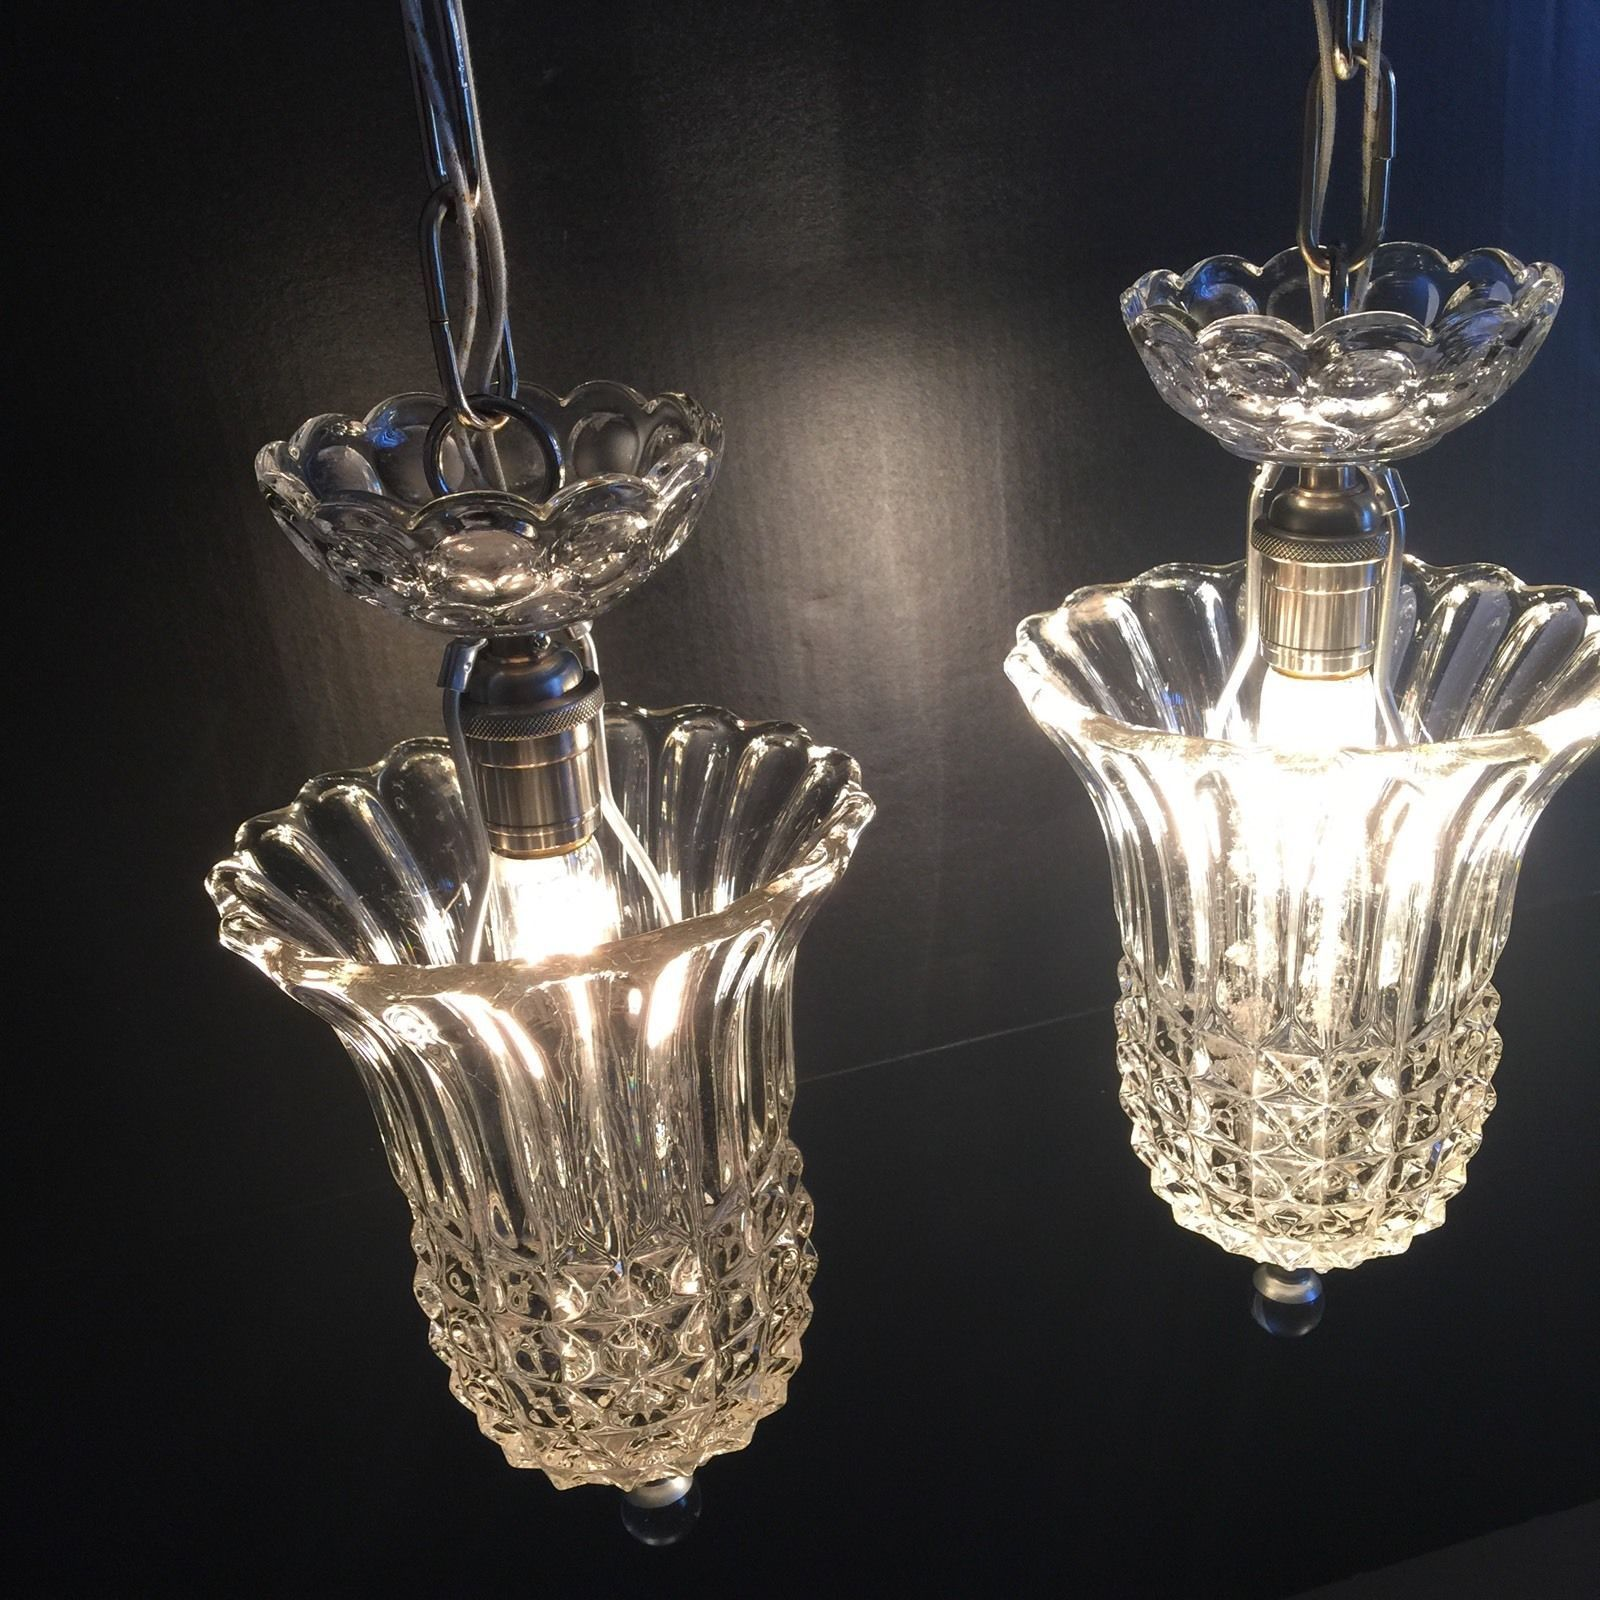 Two 2 1940s heavy glass pendant lights beautiful ebay